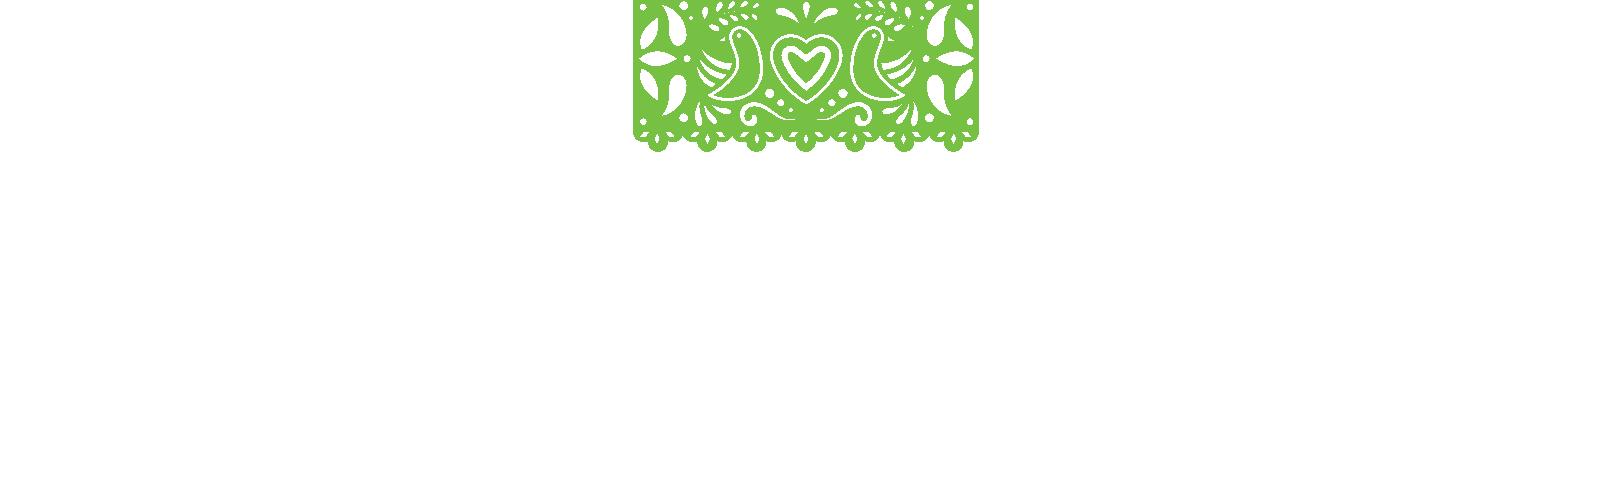 Velas Magazine - The stylish way to travel